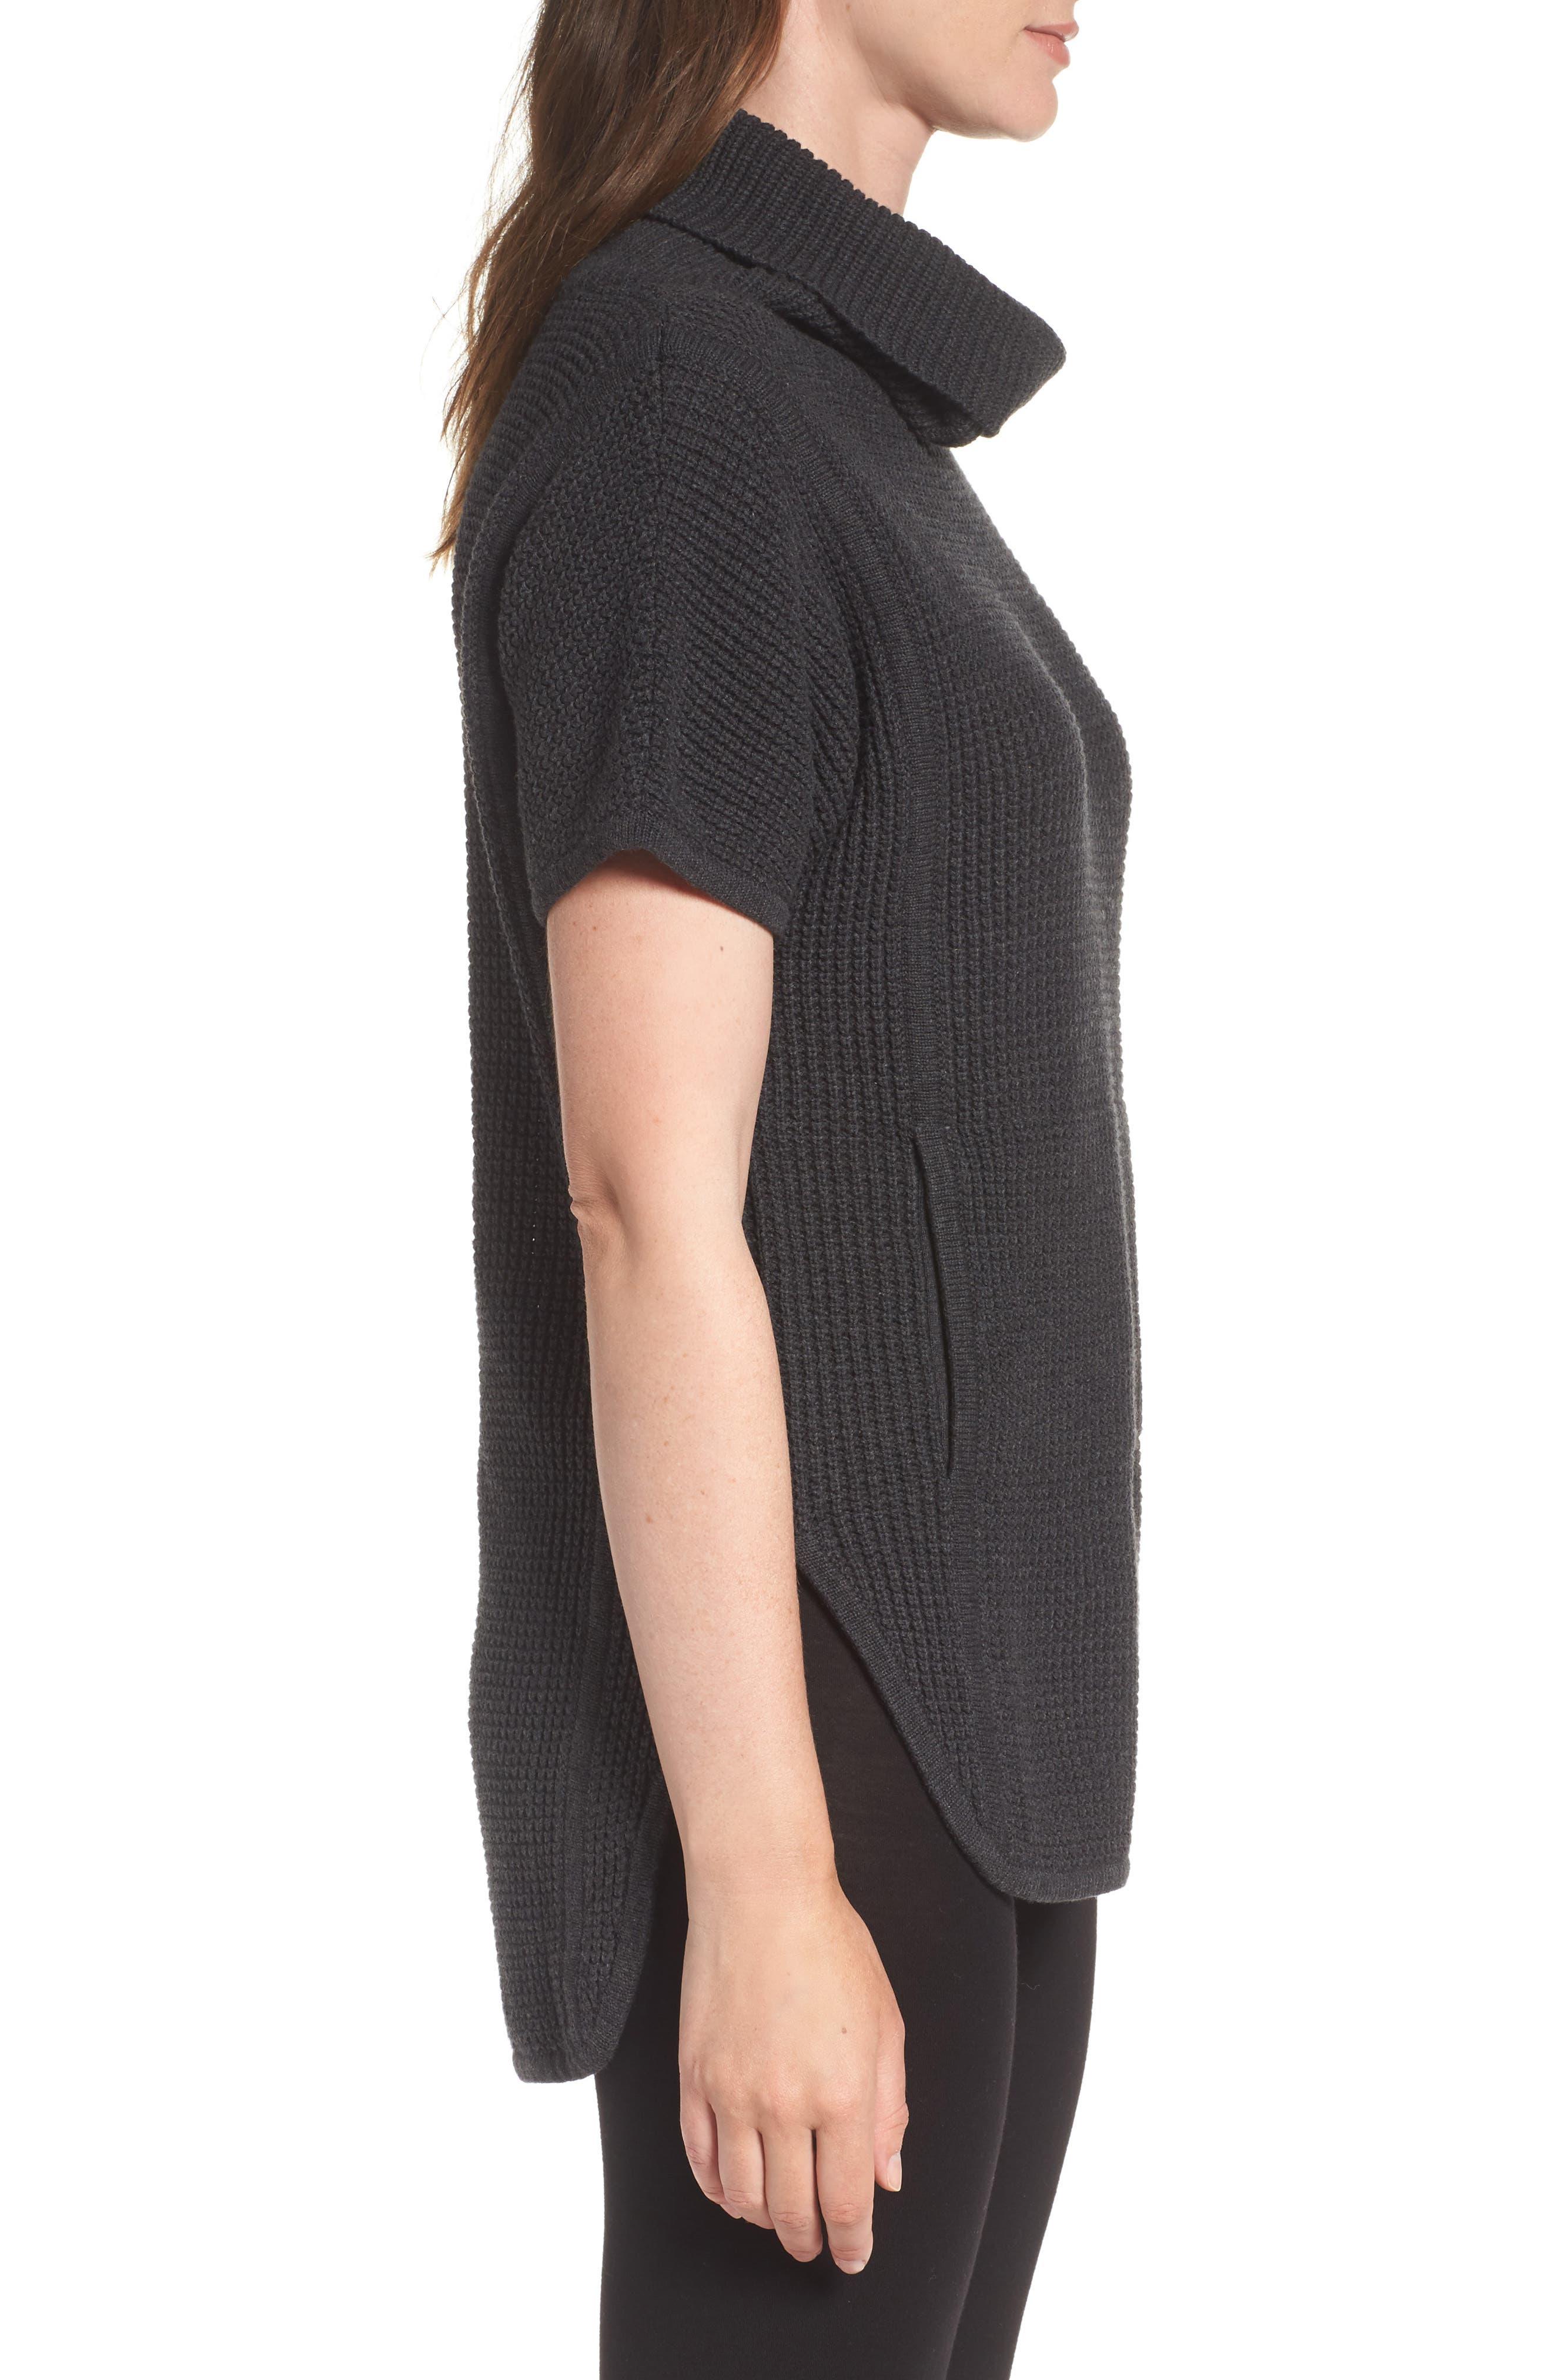 Alternate Image 3  - UGG® 'Selby' Turtleneck Cotton Knit Pullover